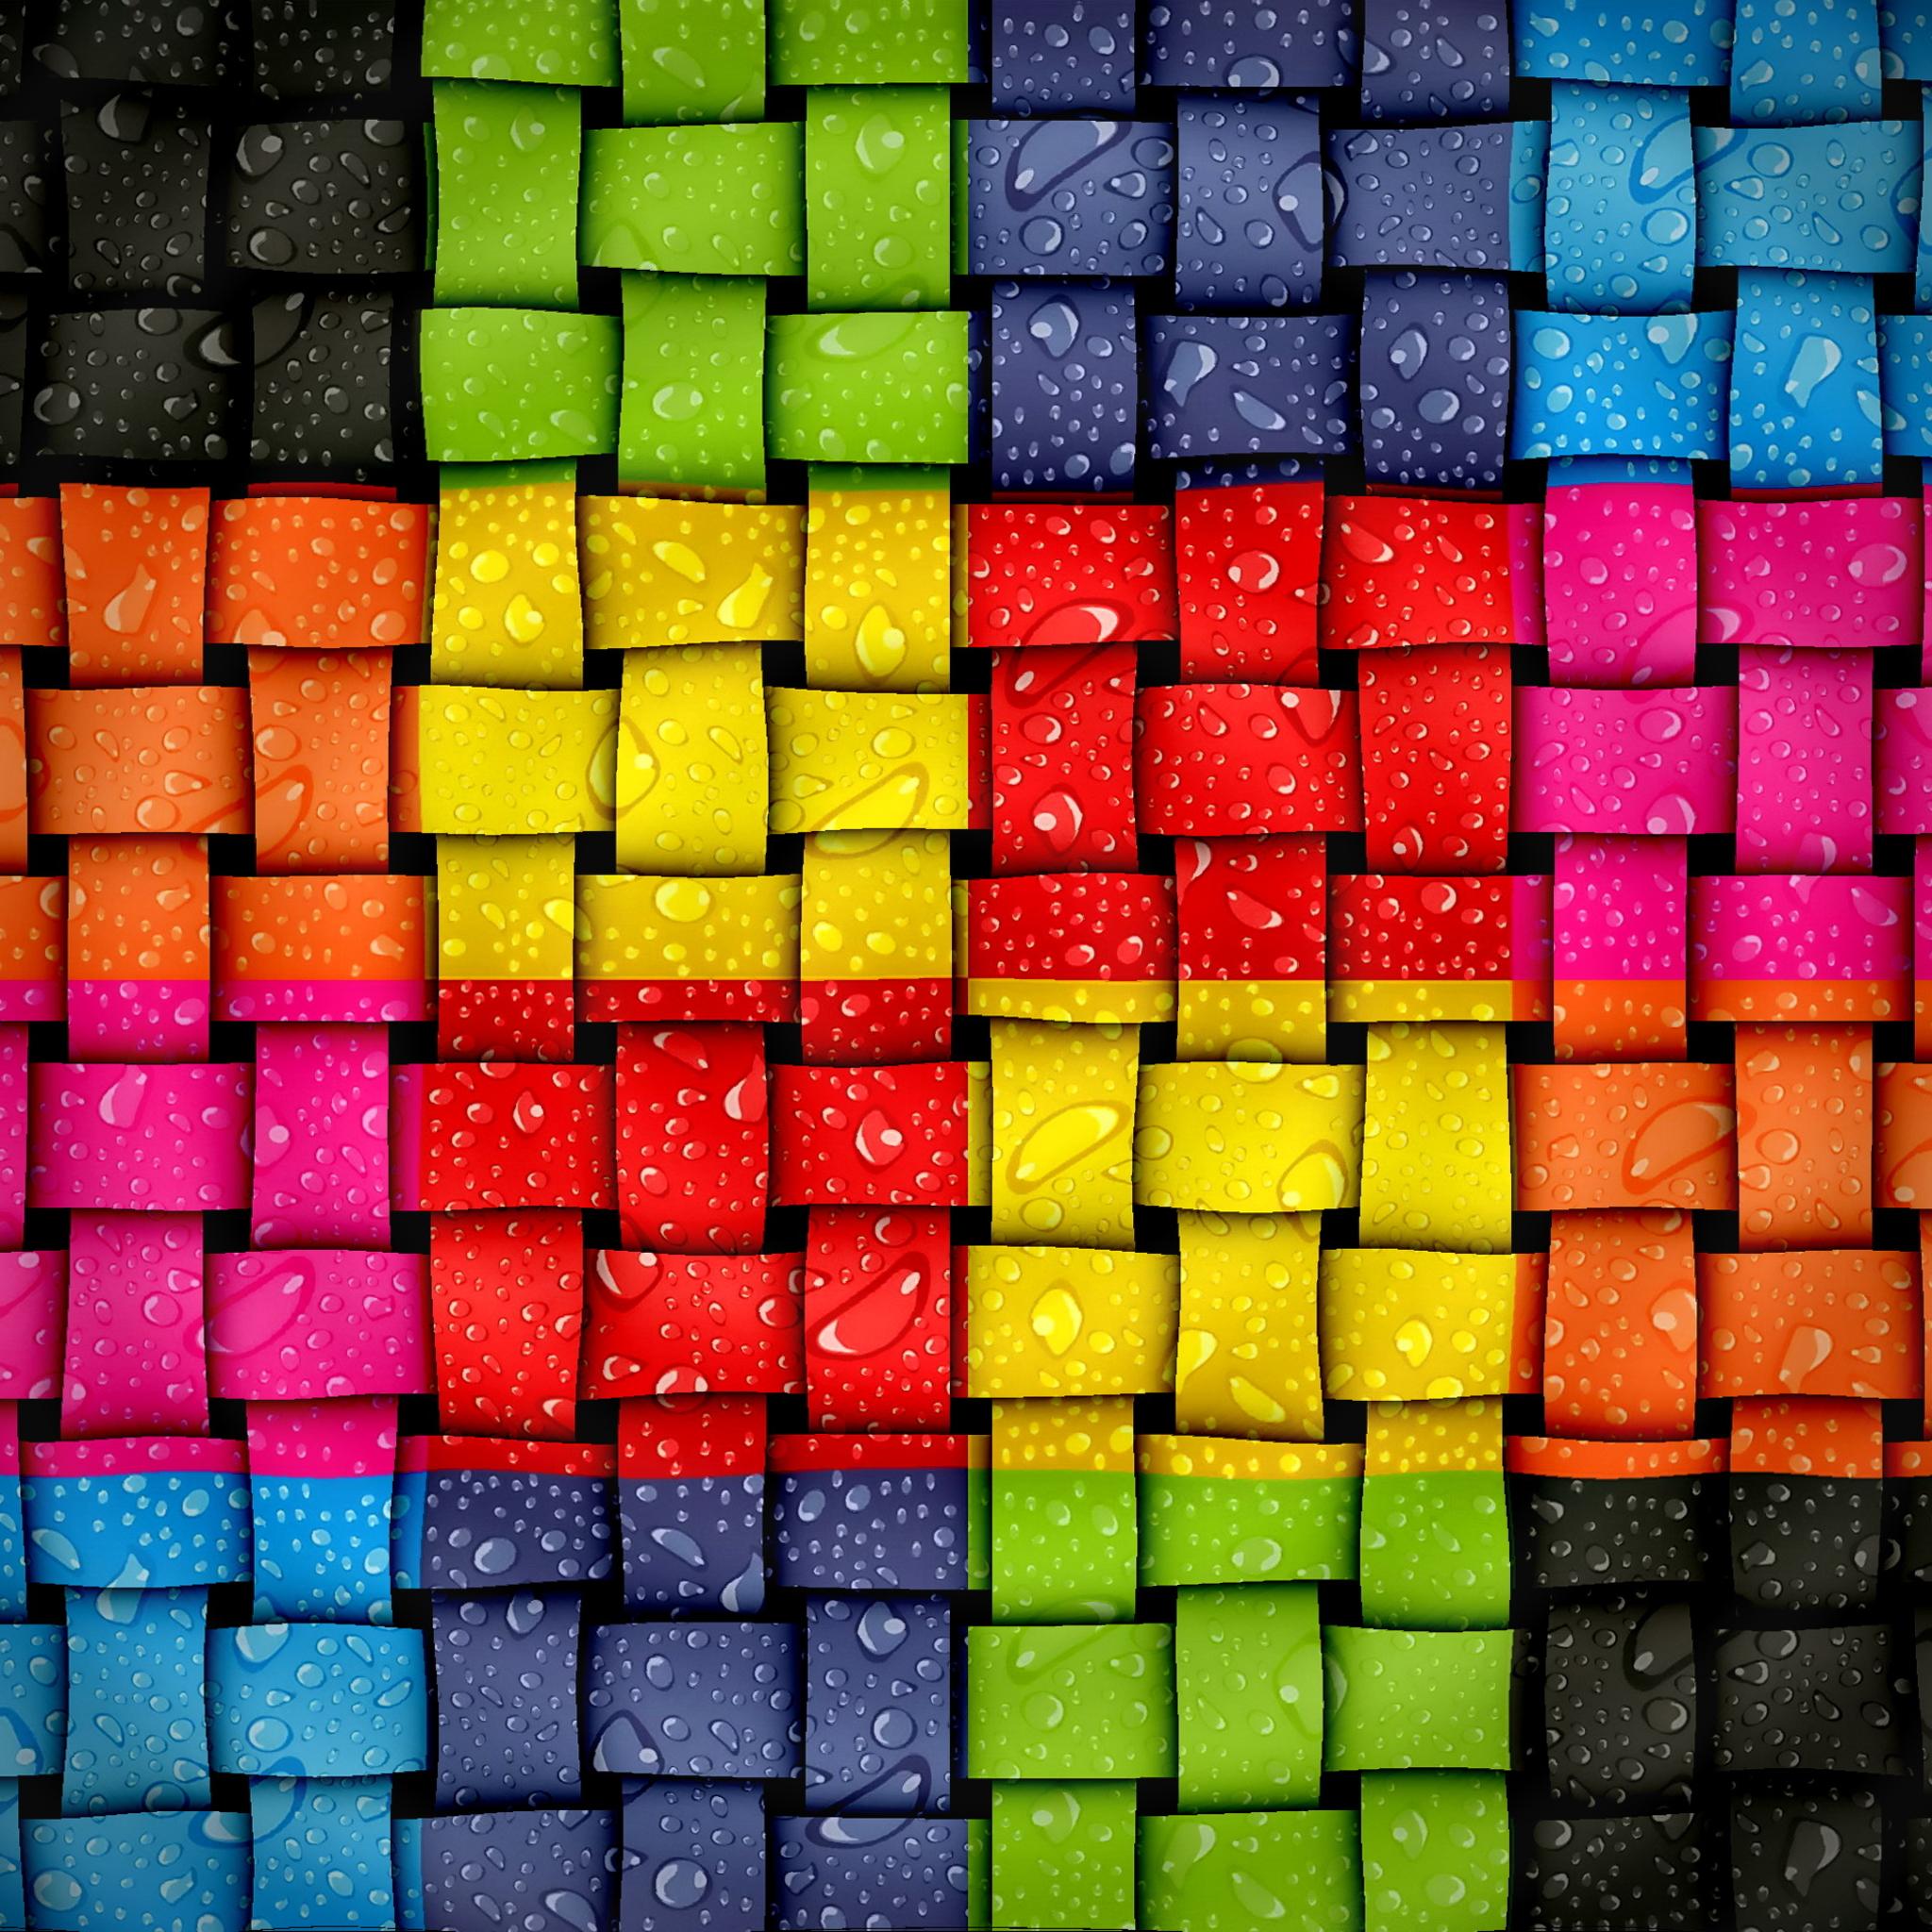 Hd wallpaper ipad -  Hd Ipad Wallpapers Download